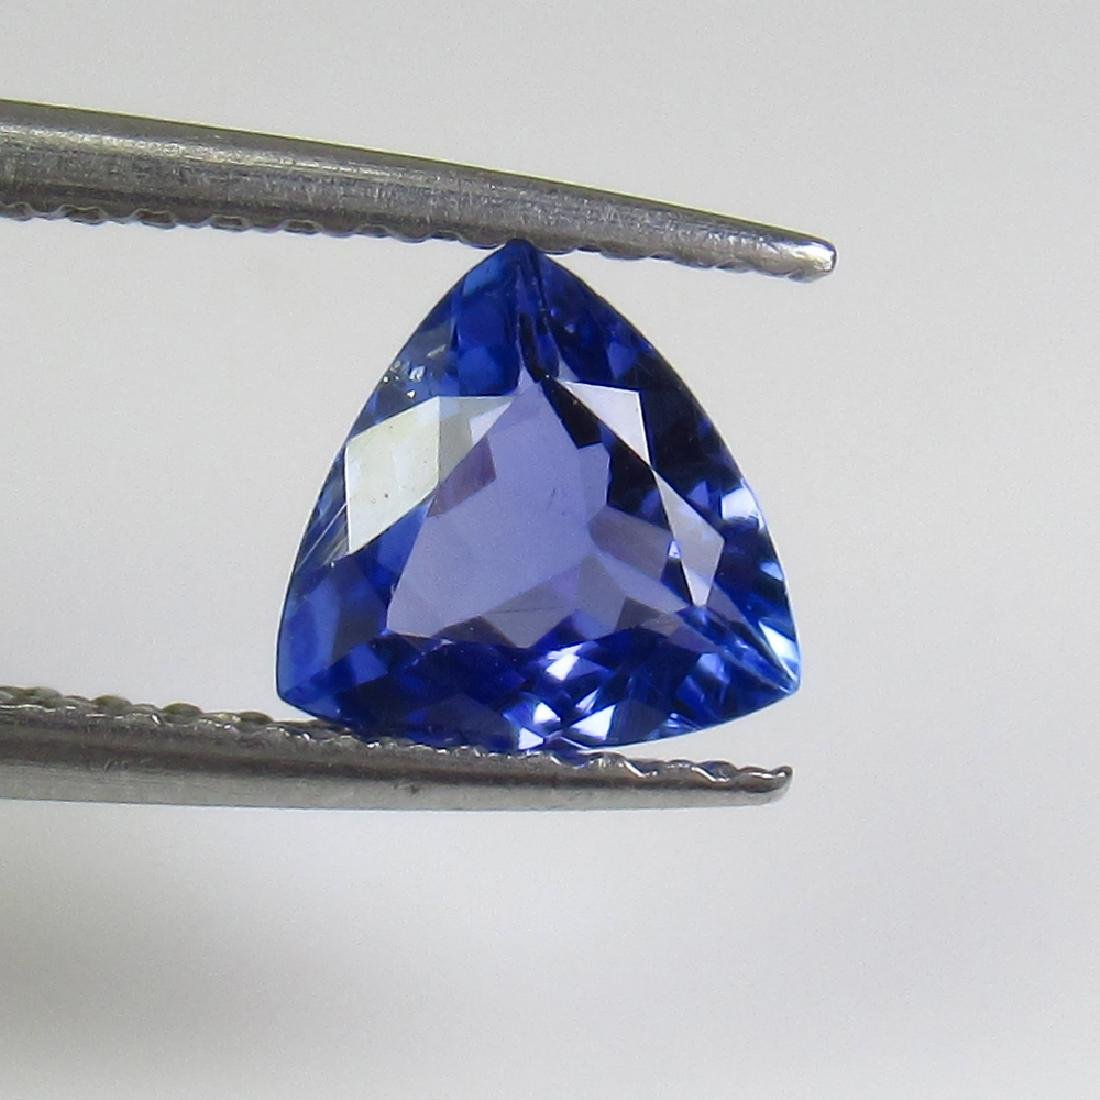 0.67 Ct Genuine Tanzanite 6X6 mm Excellent Trillion Cut